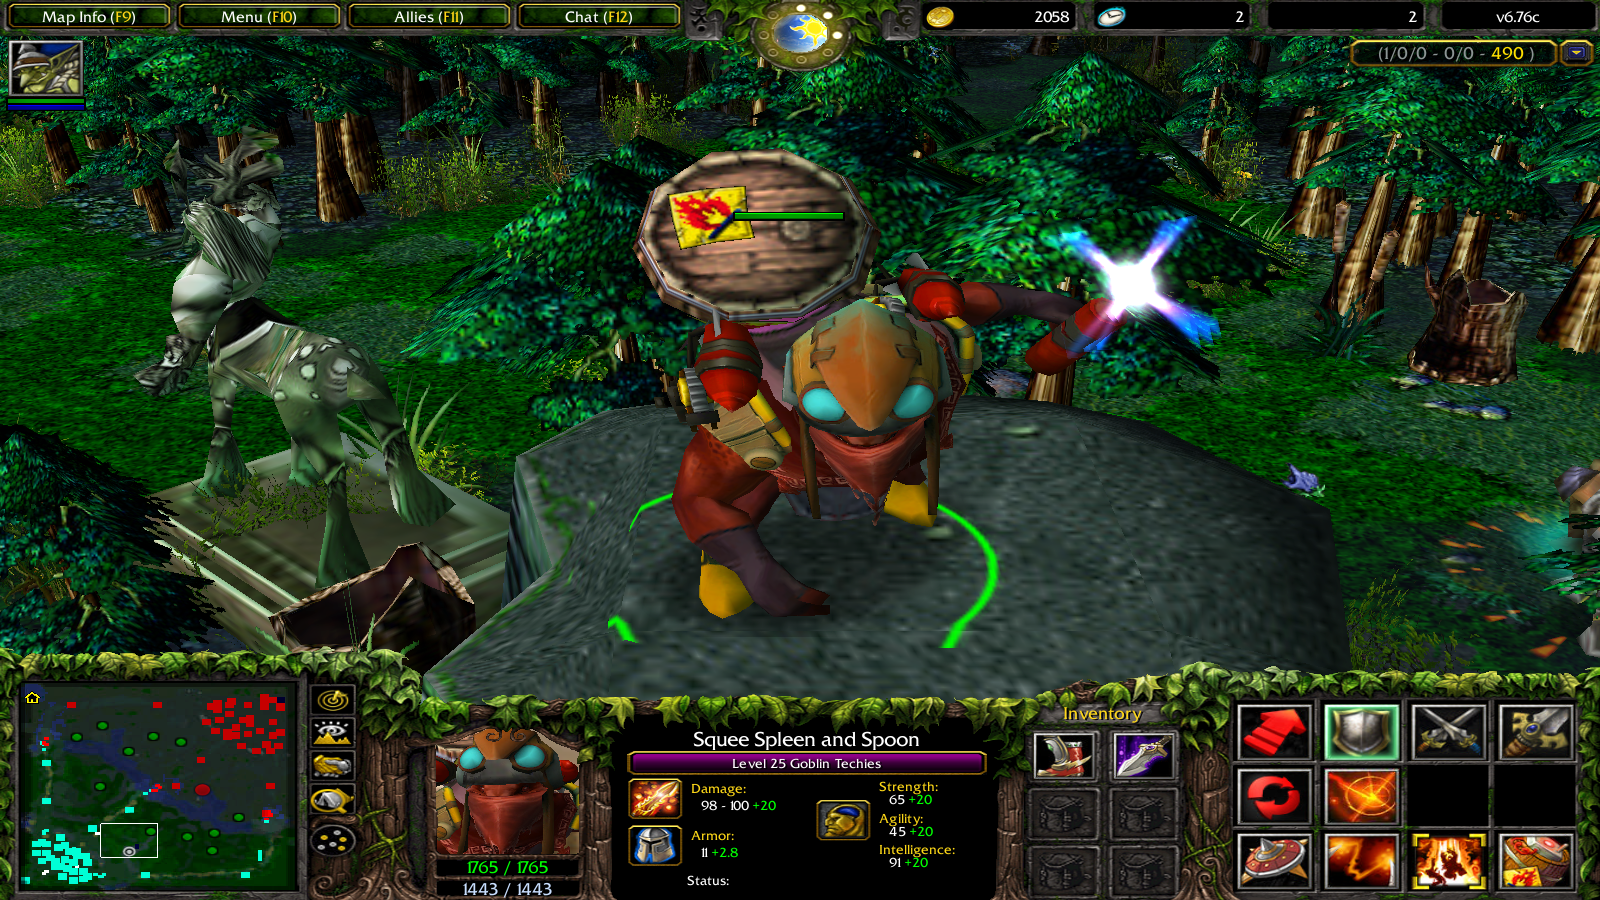 Warcraft iii 1 2 patchhttp: //adfoc